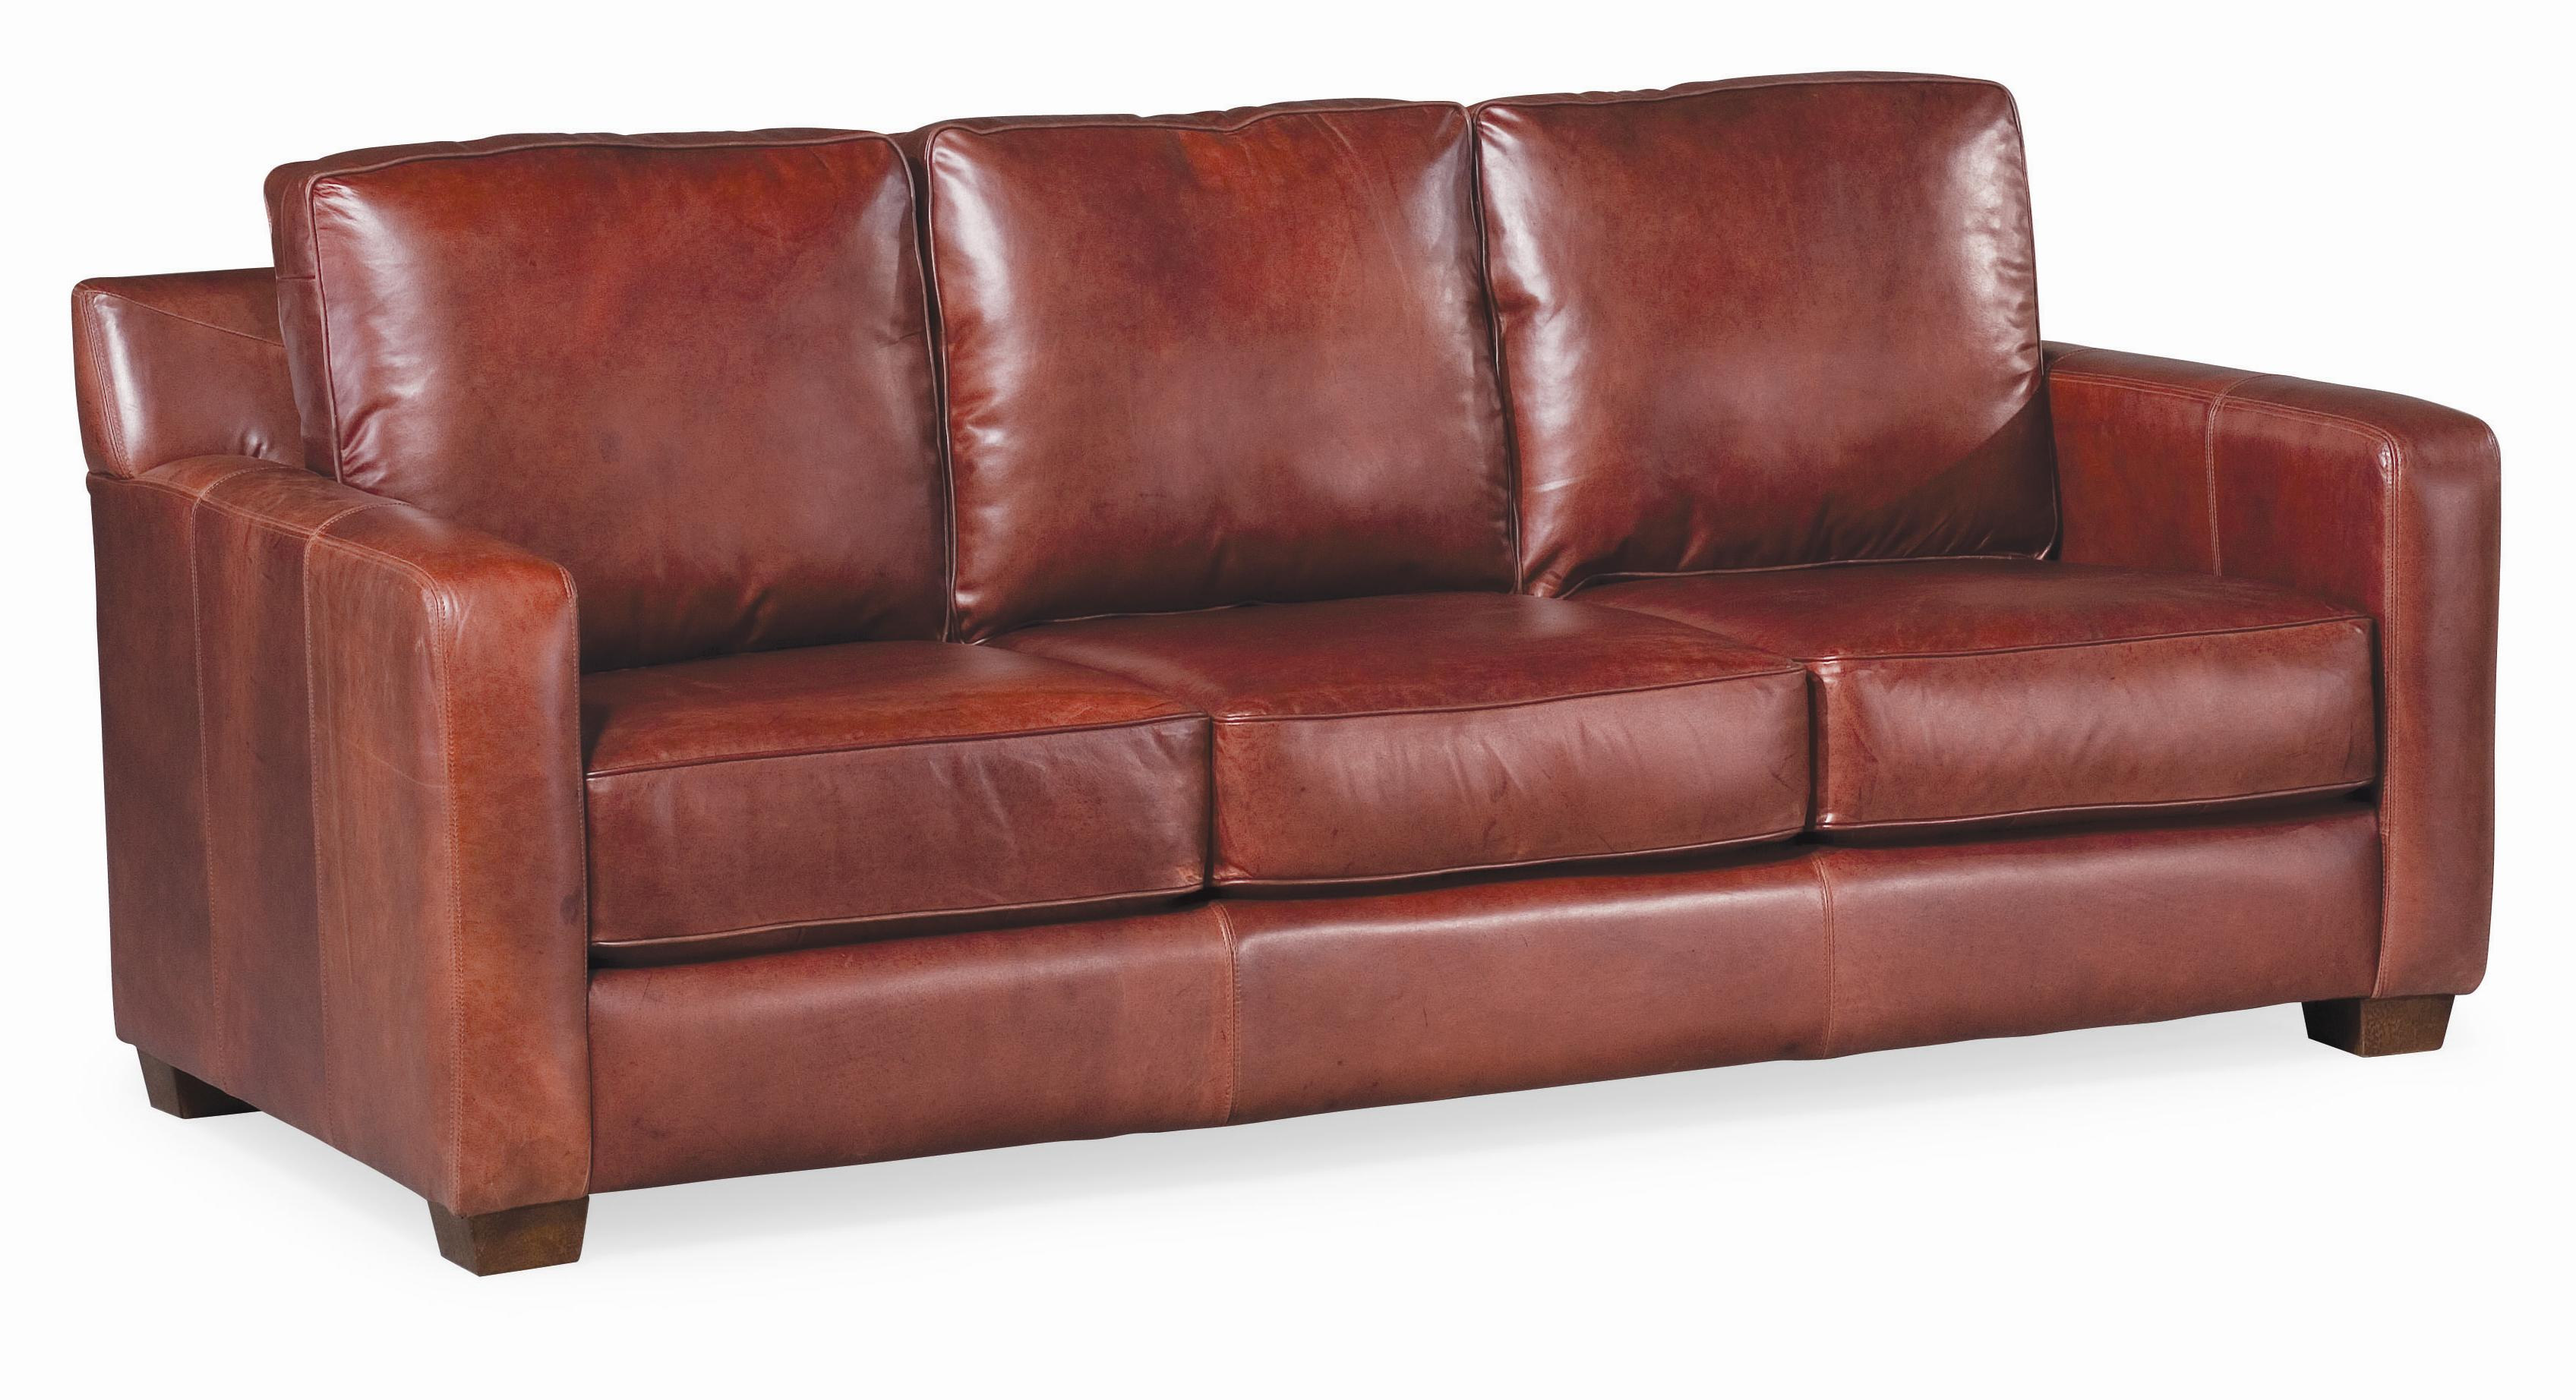 thomasville benjamin sofa leather upholstery dubai surrey